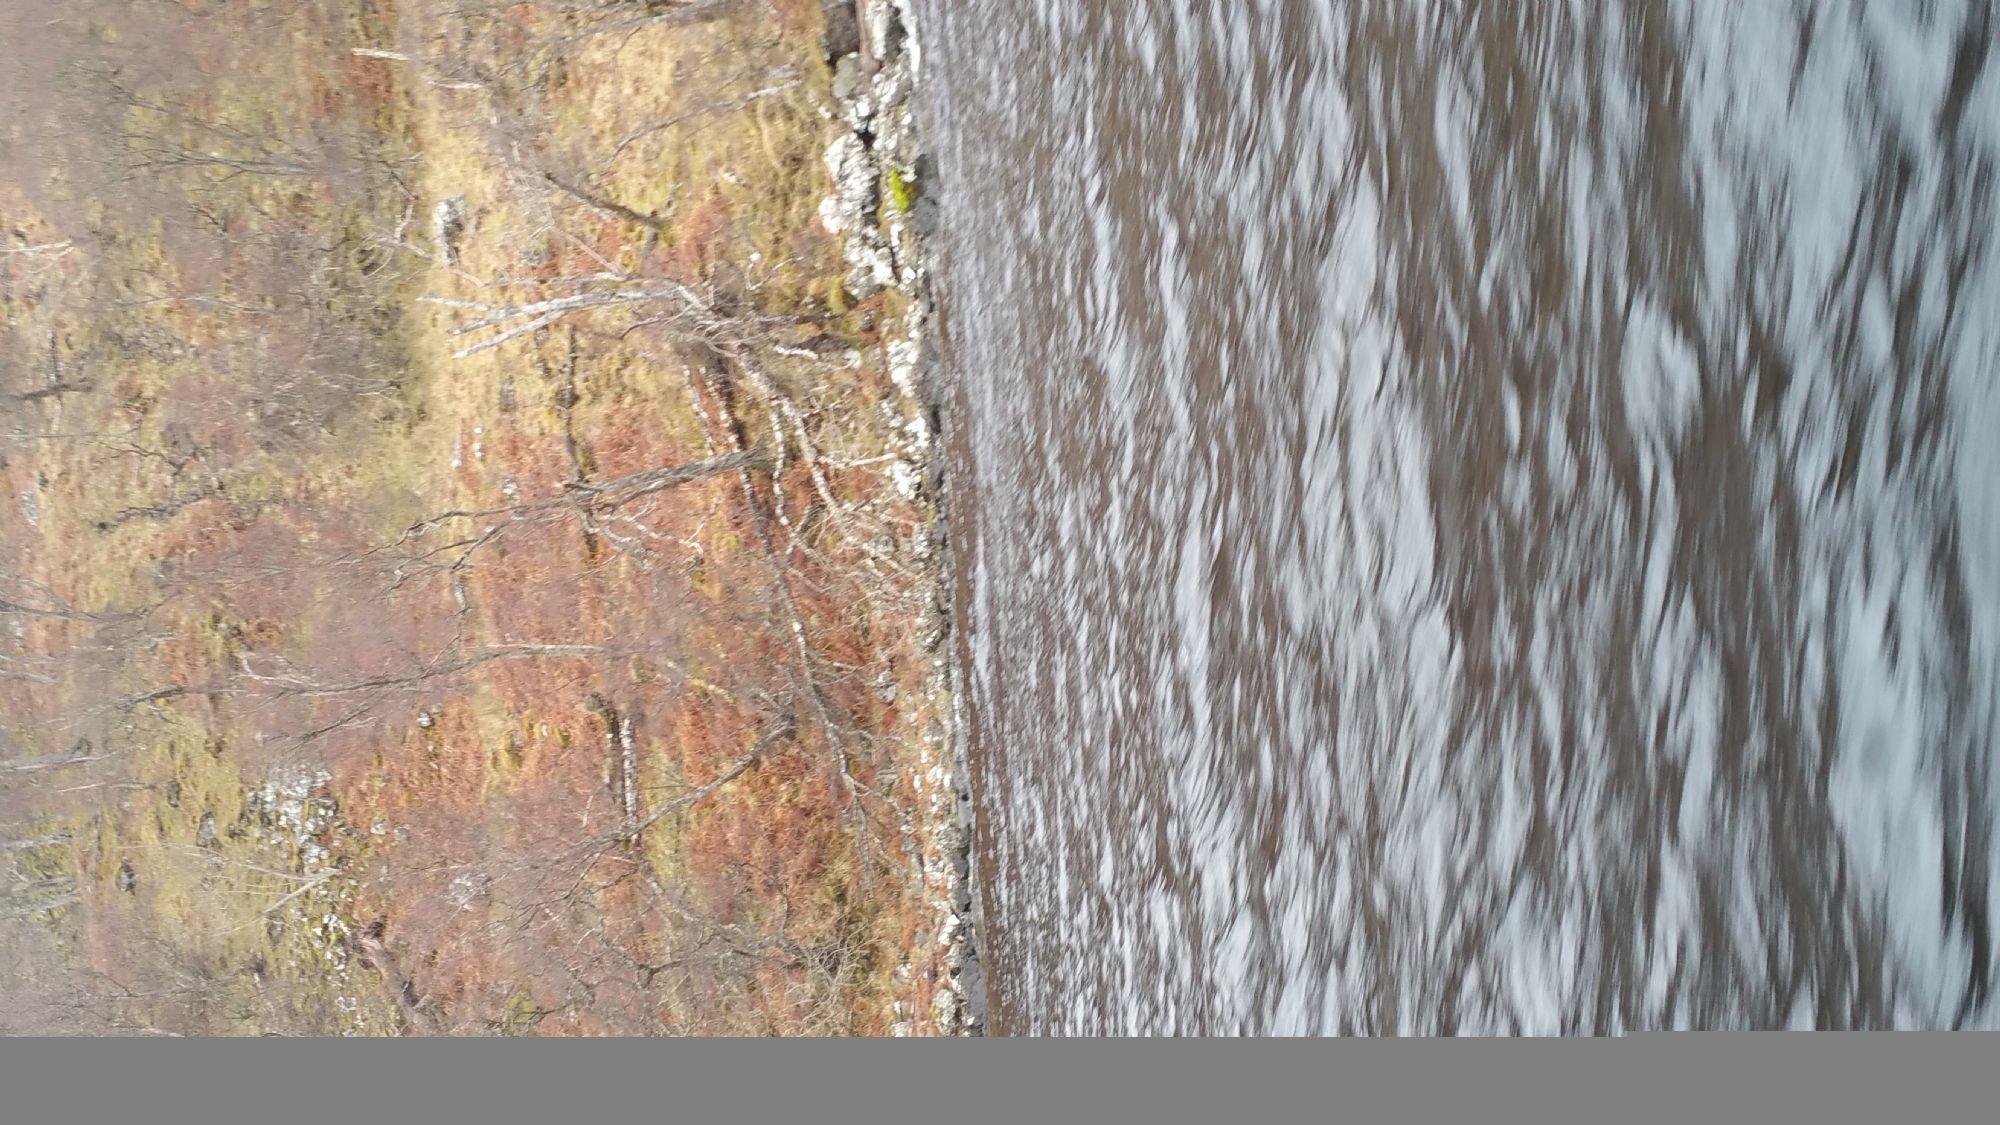 Loch Ness : the bank